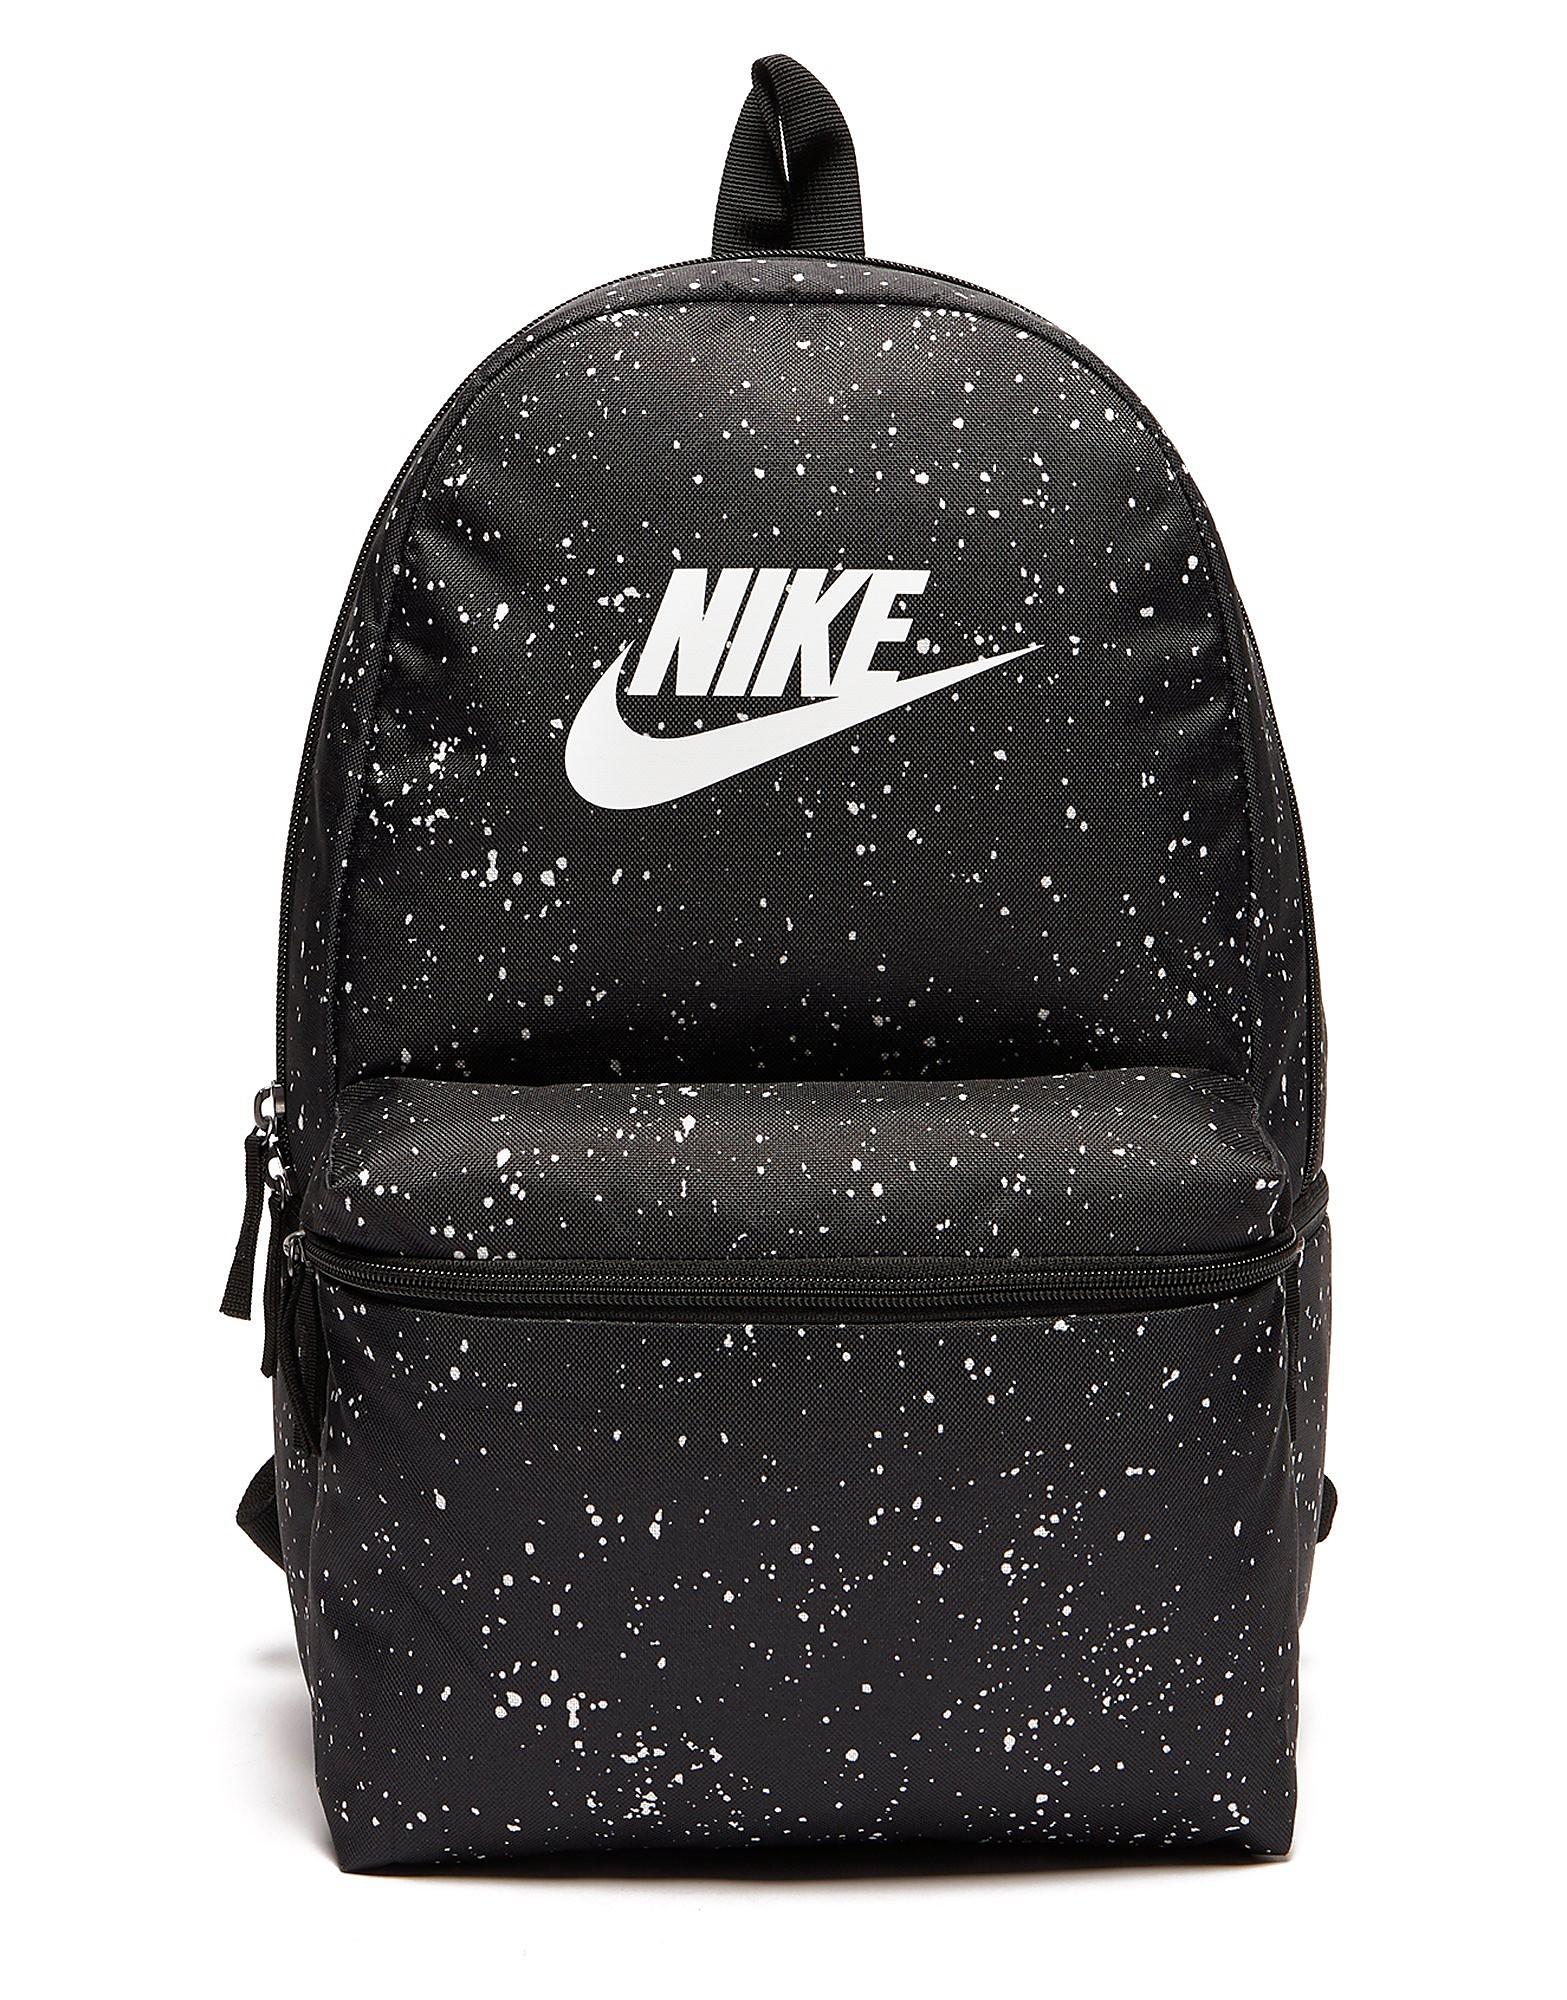 Nike Futura Speckle Backpack